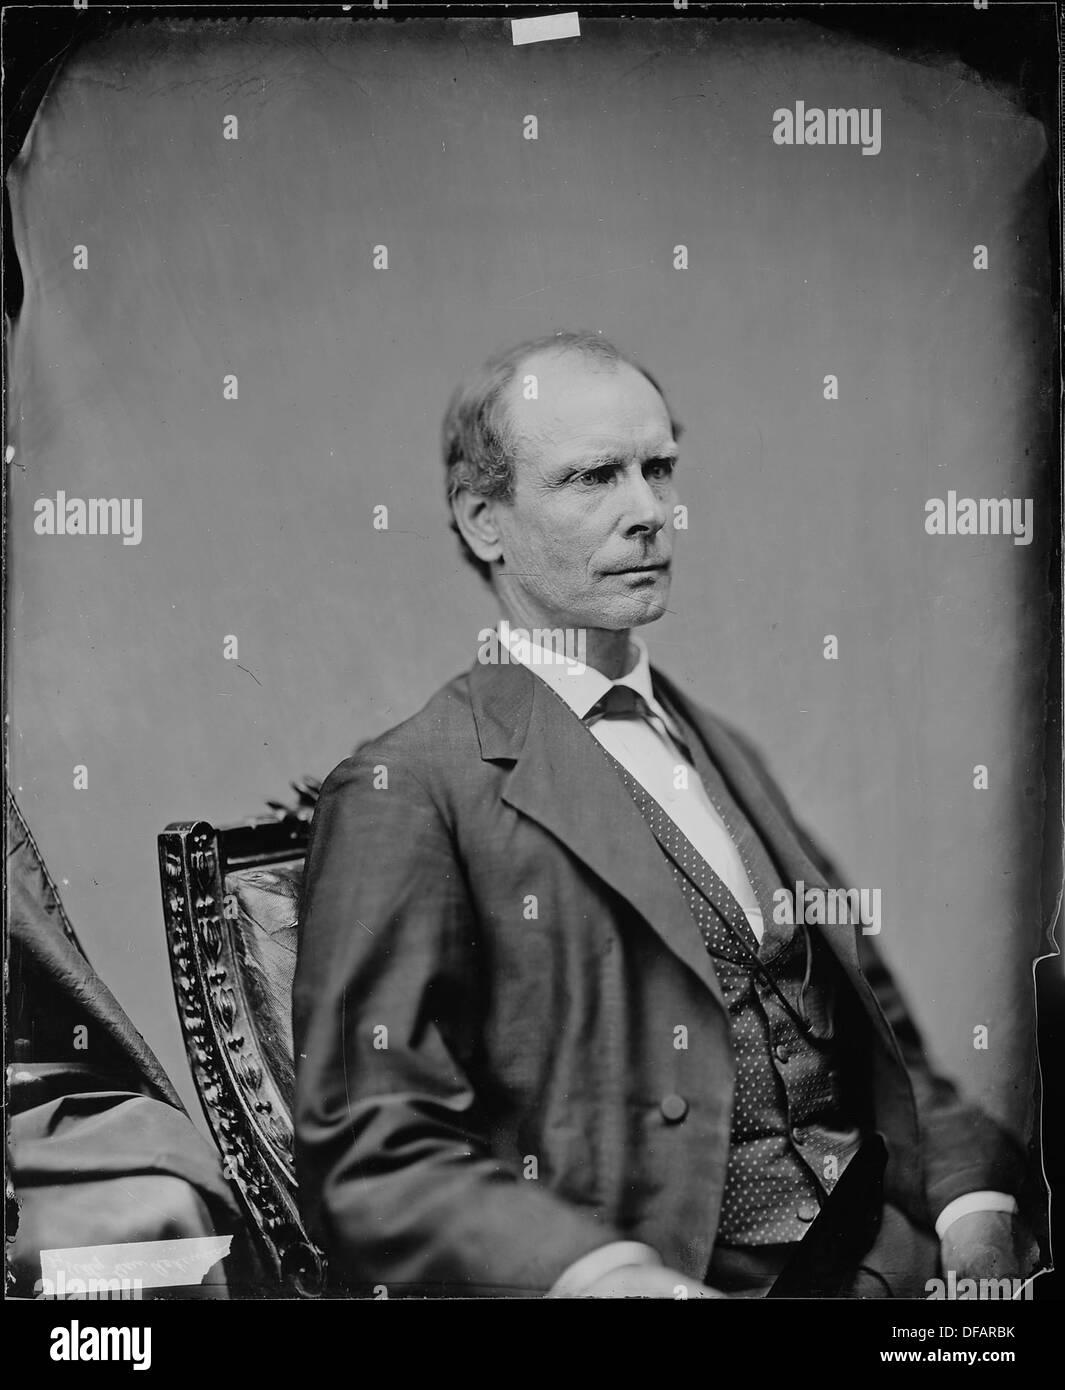 Amos T. Ackerman, Attorney General, U.S 528711 - Stock Image